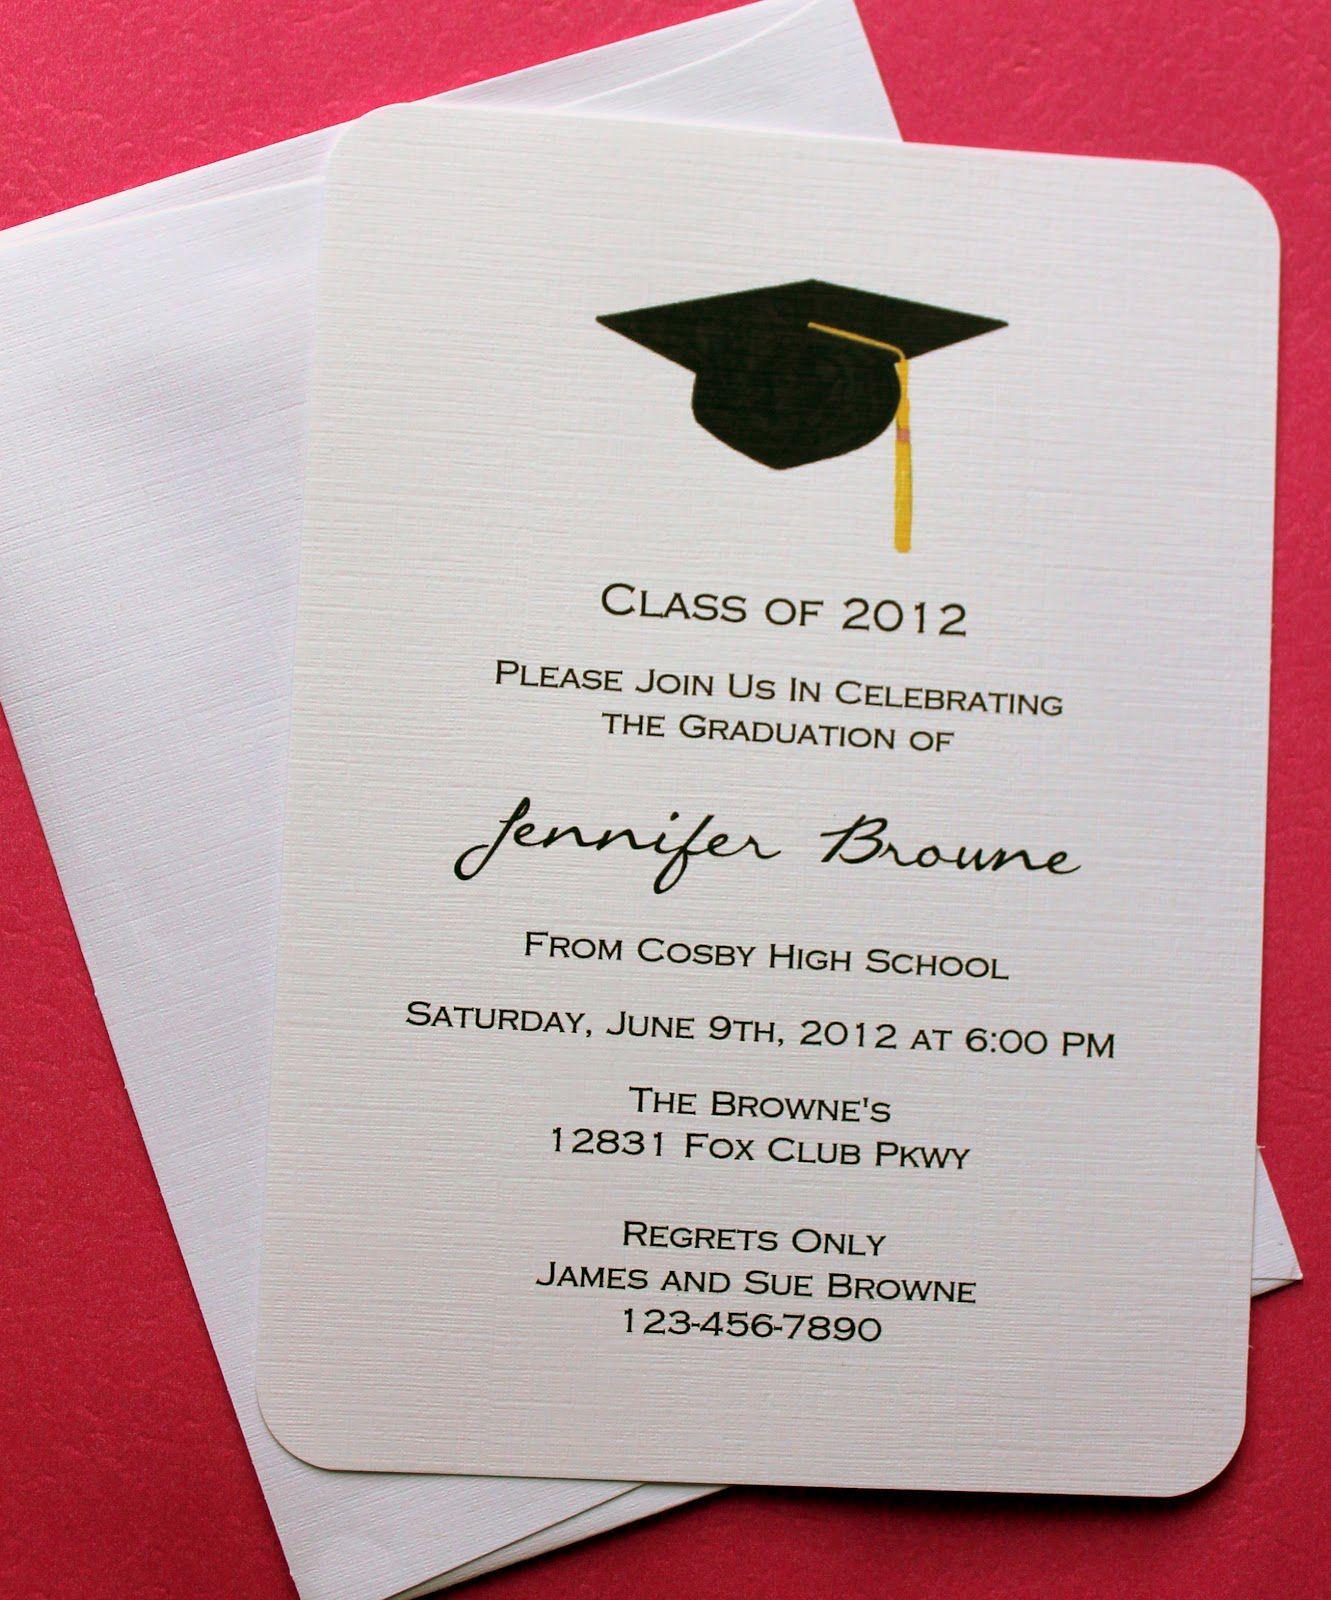 Graduation Invitation Templates Microsoft Word   Graduation Regarding Graduation Party Invitation Templates Free Word